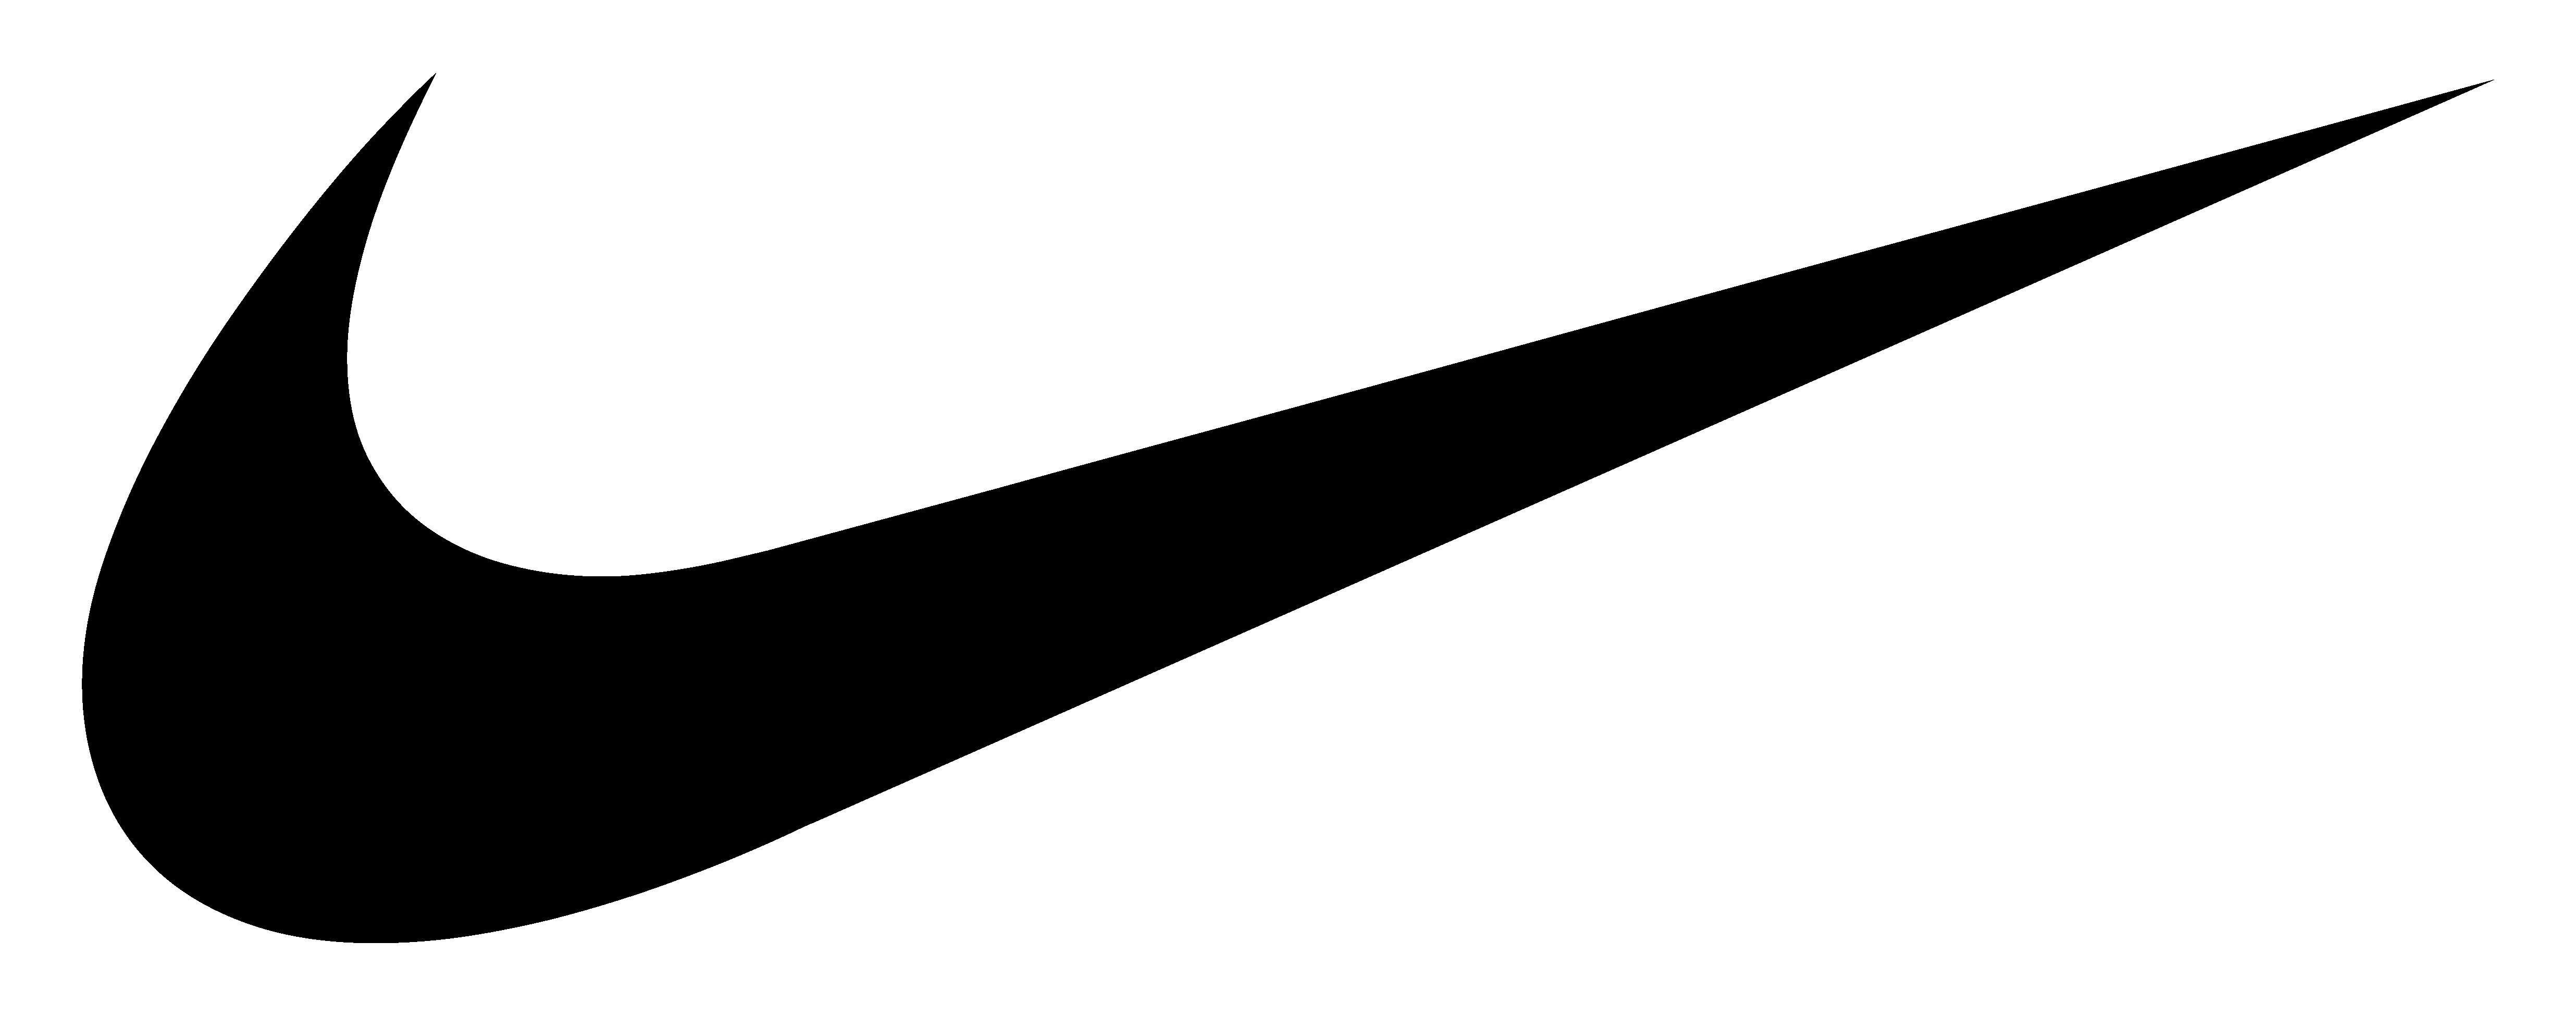 Nike logo PNG images free download - Nike Logo Outline